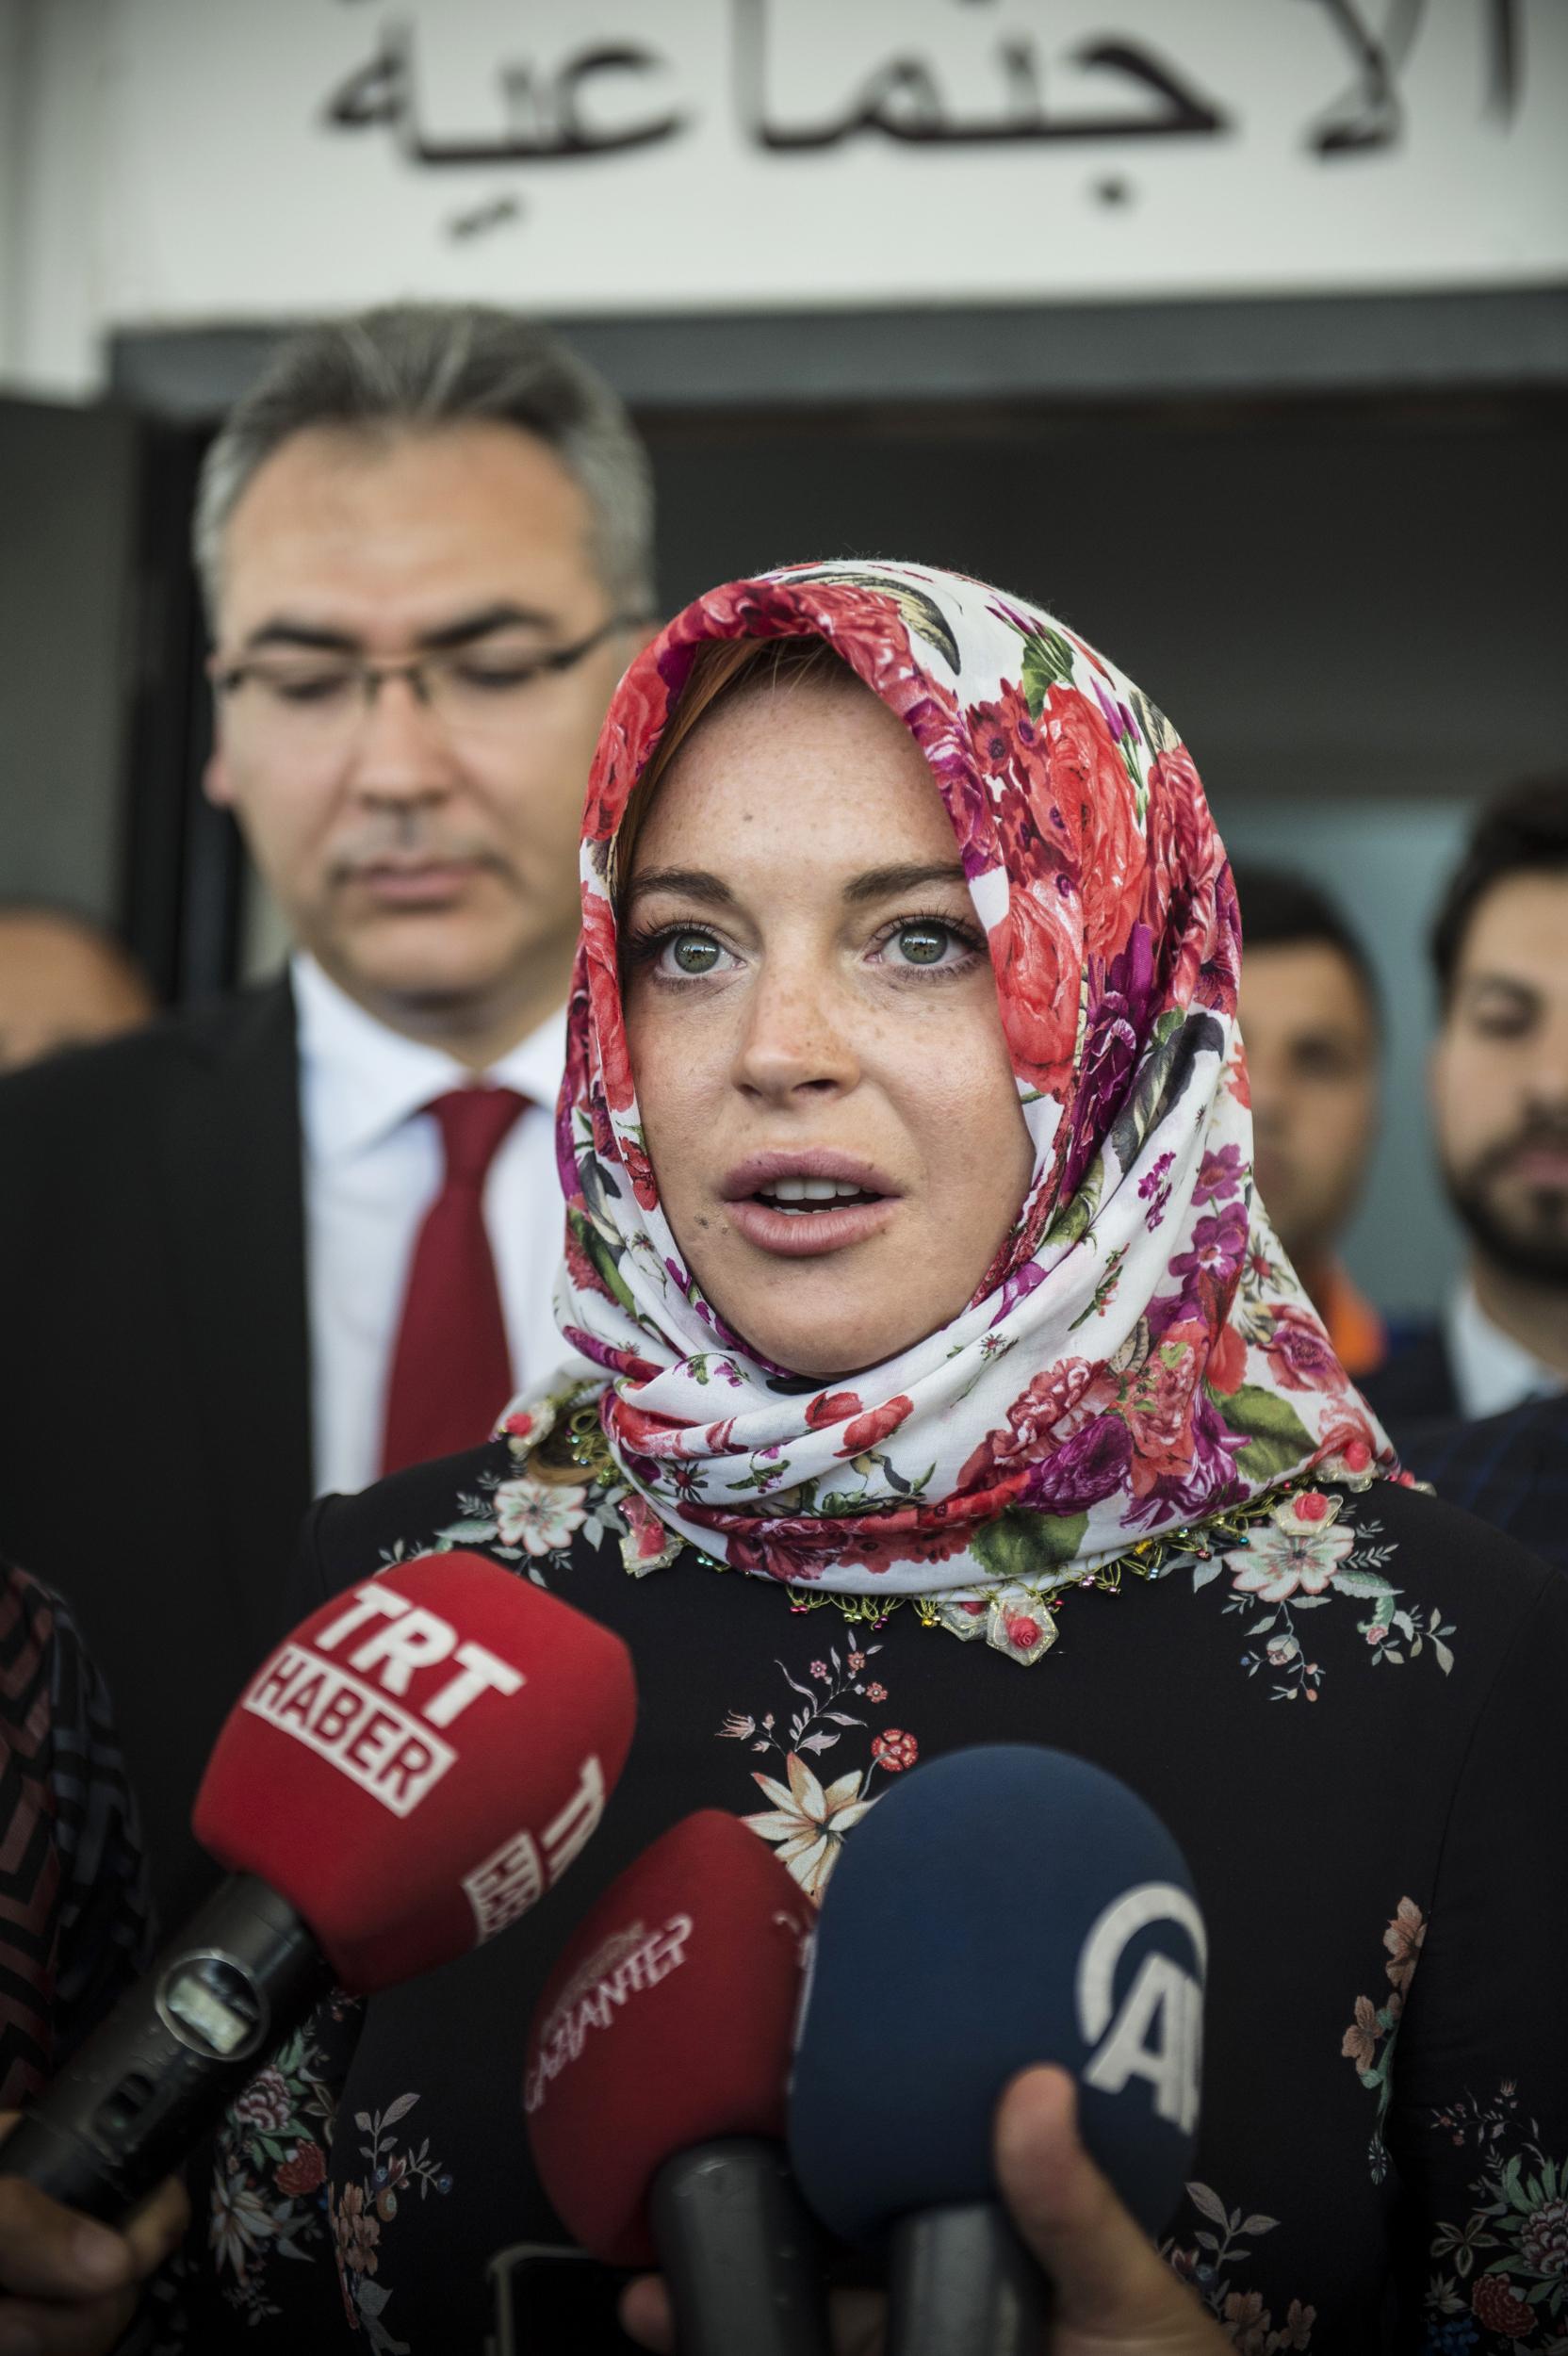 Lindsay Lohan Says She Was Profiled While Wearing Headscarf